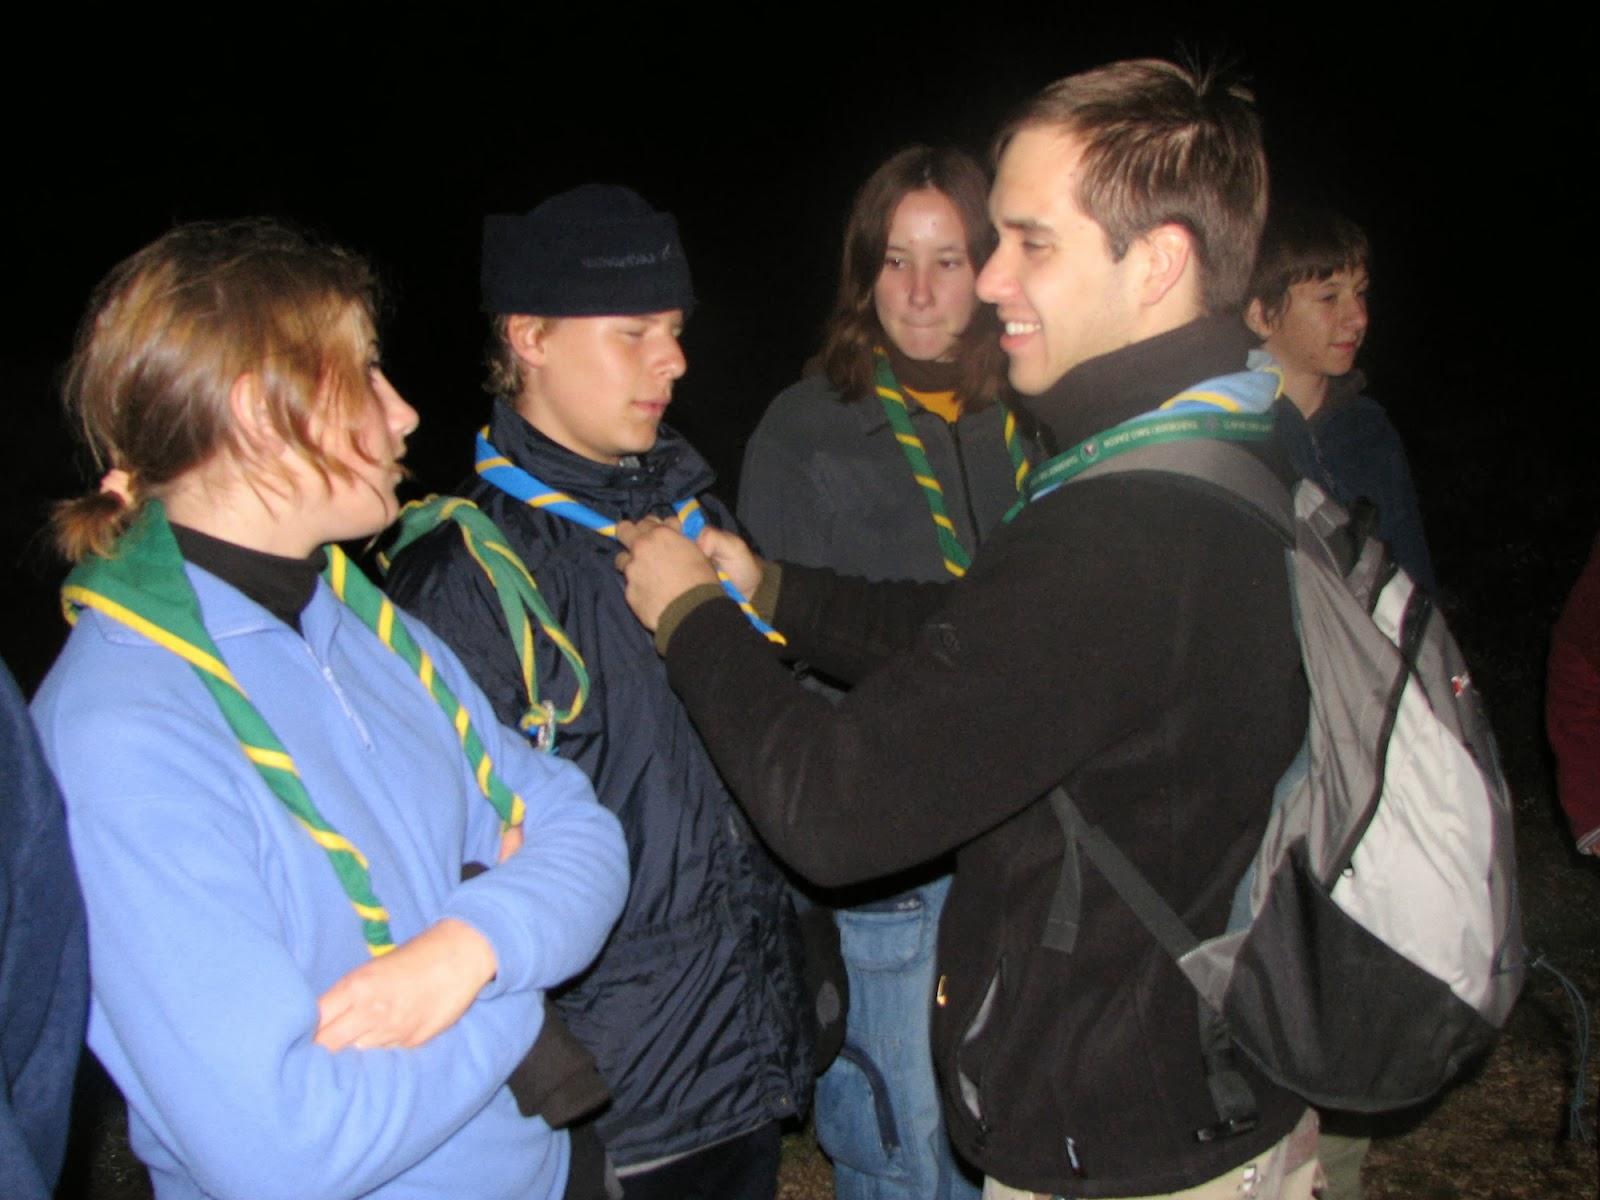 Prehod PP, Ilirska Bistrica 2005 - picture%2B081.jpg